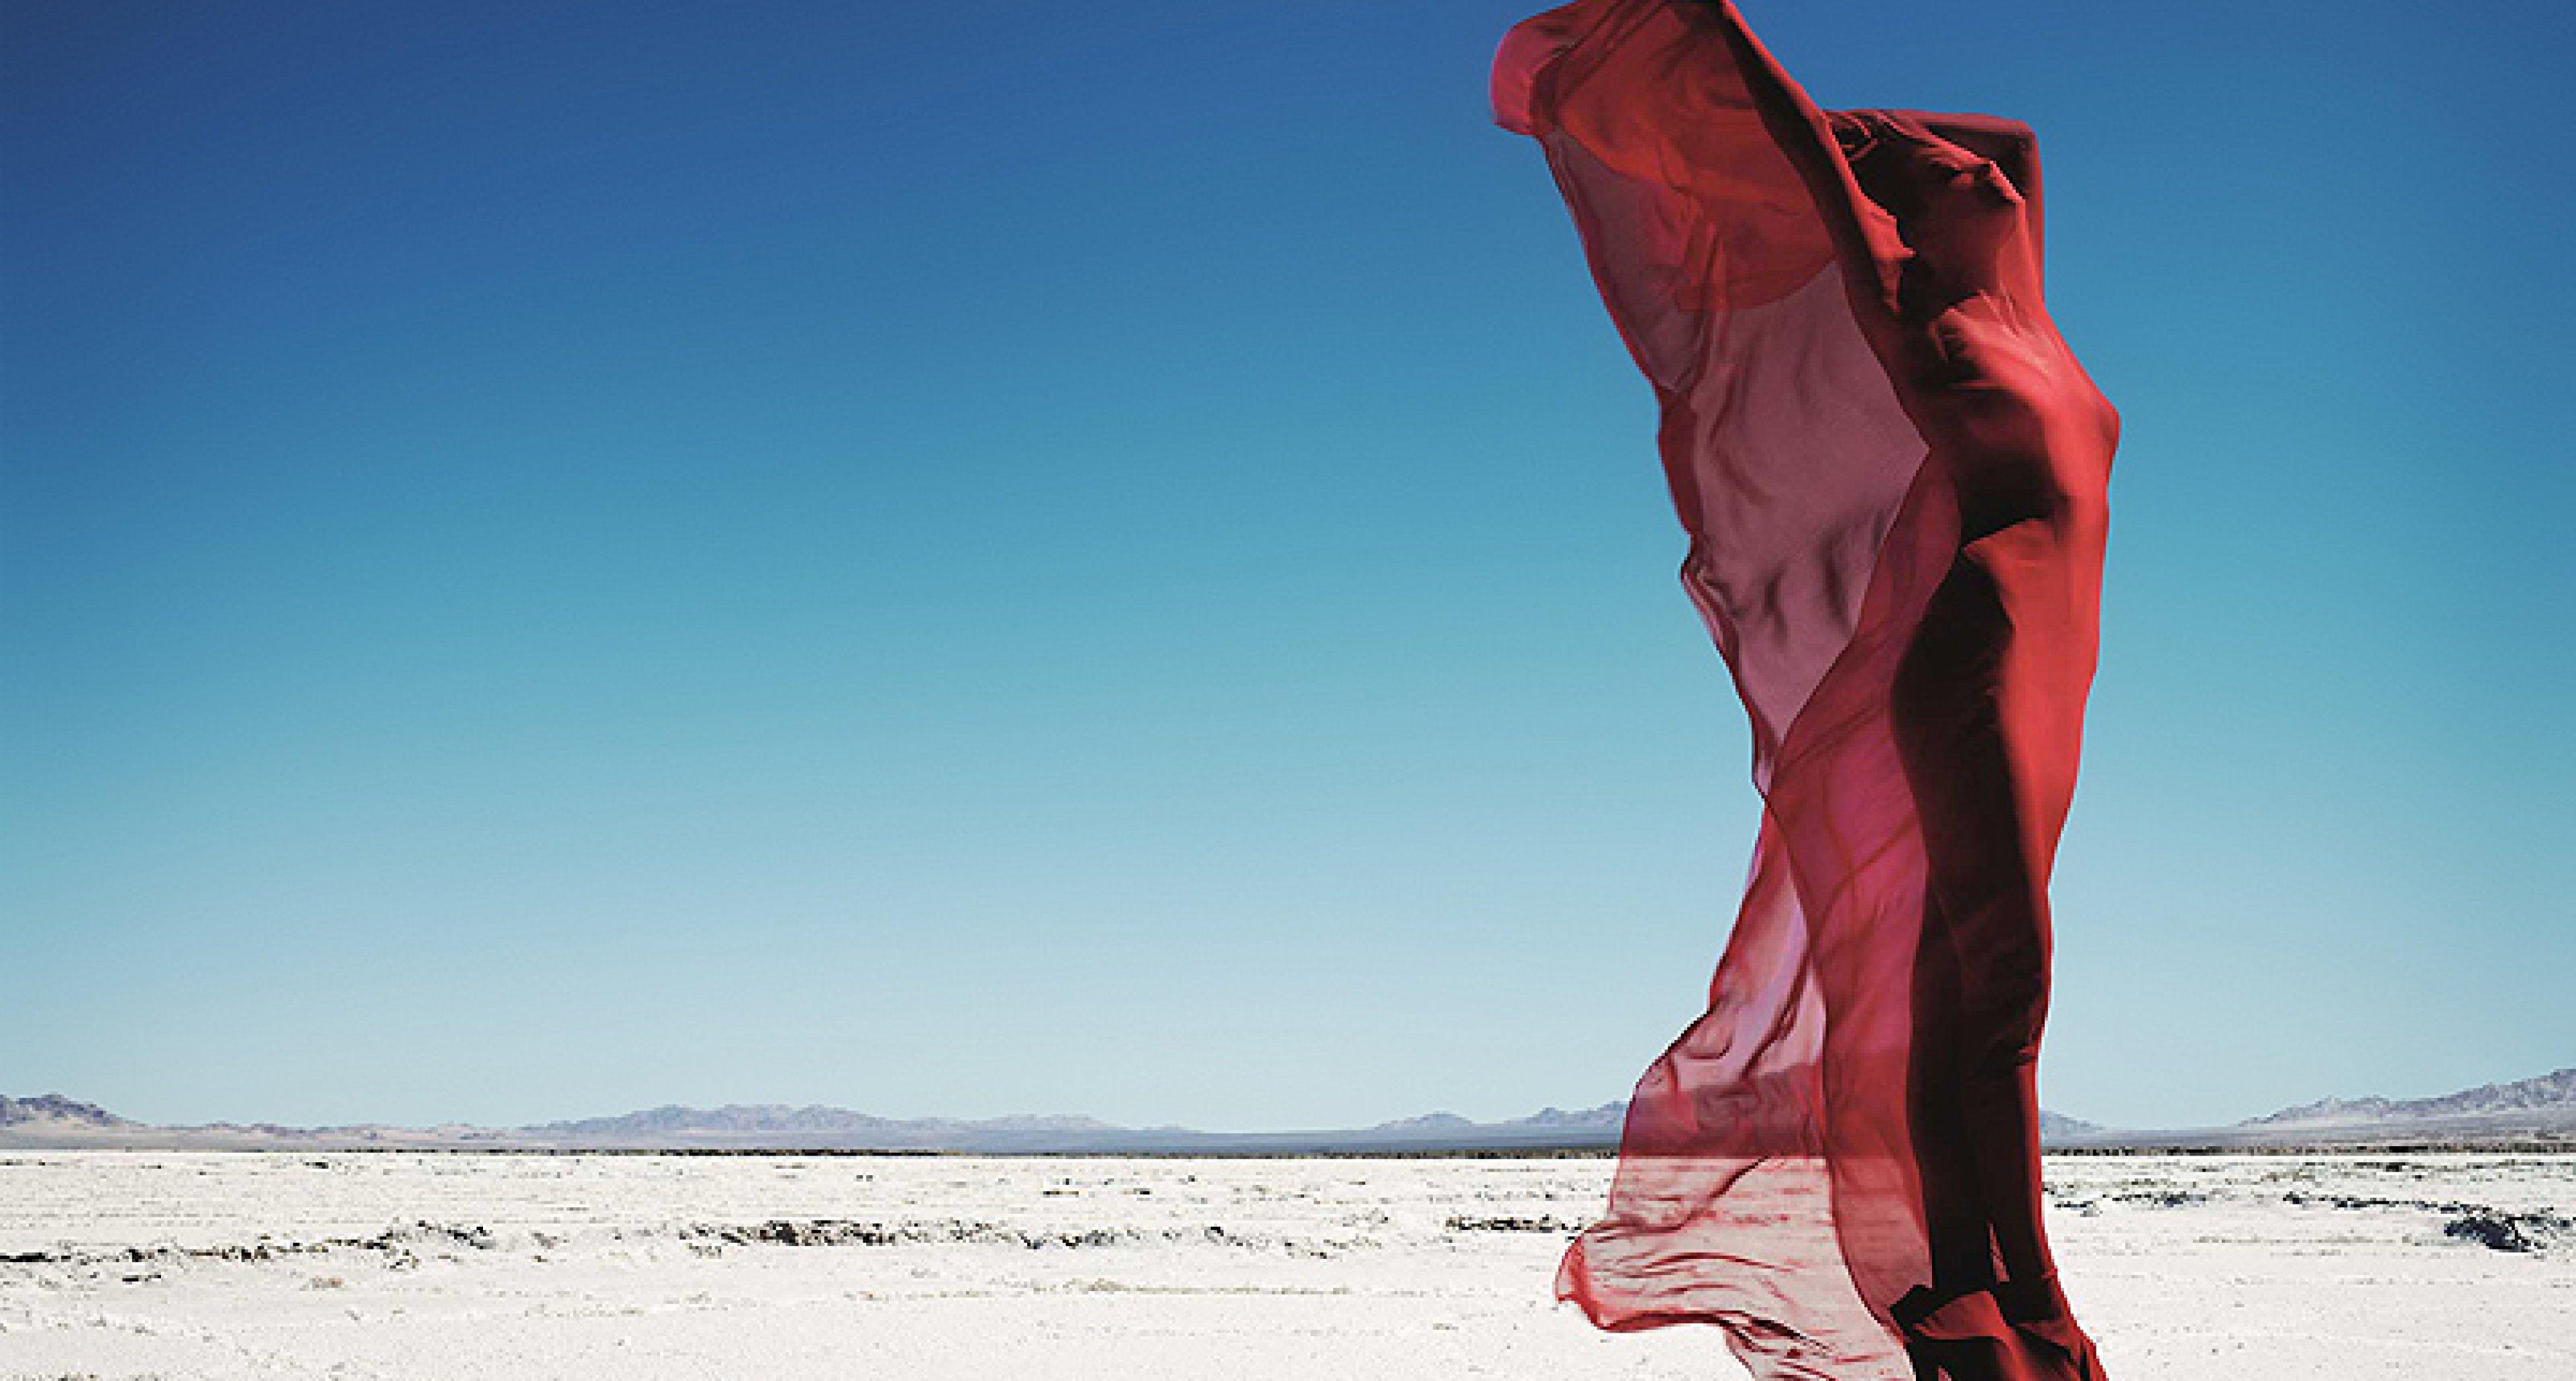 Rankin Rolls-Royce 'Spirit of Ecstasy' Exhibition in Los Angeles